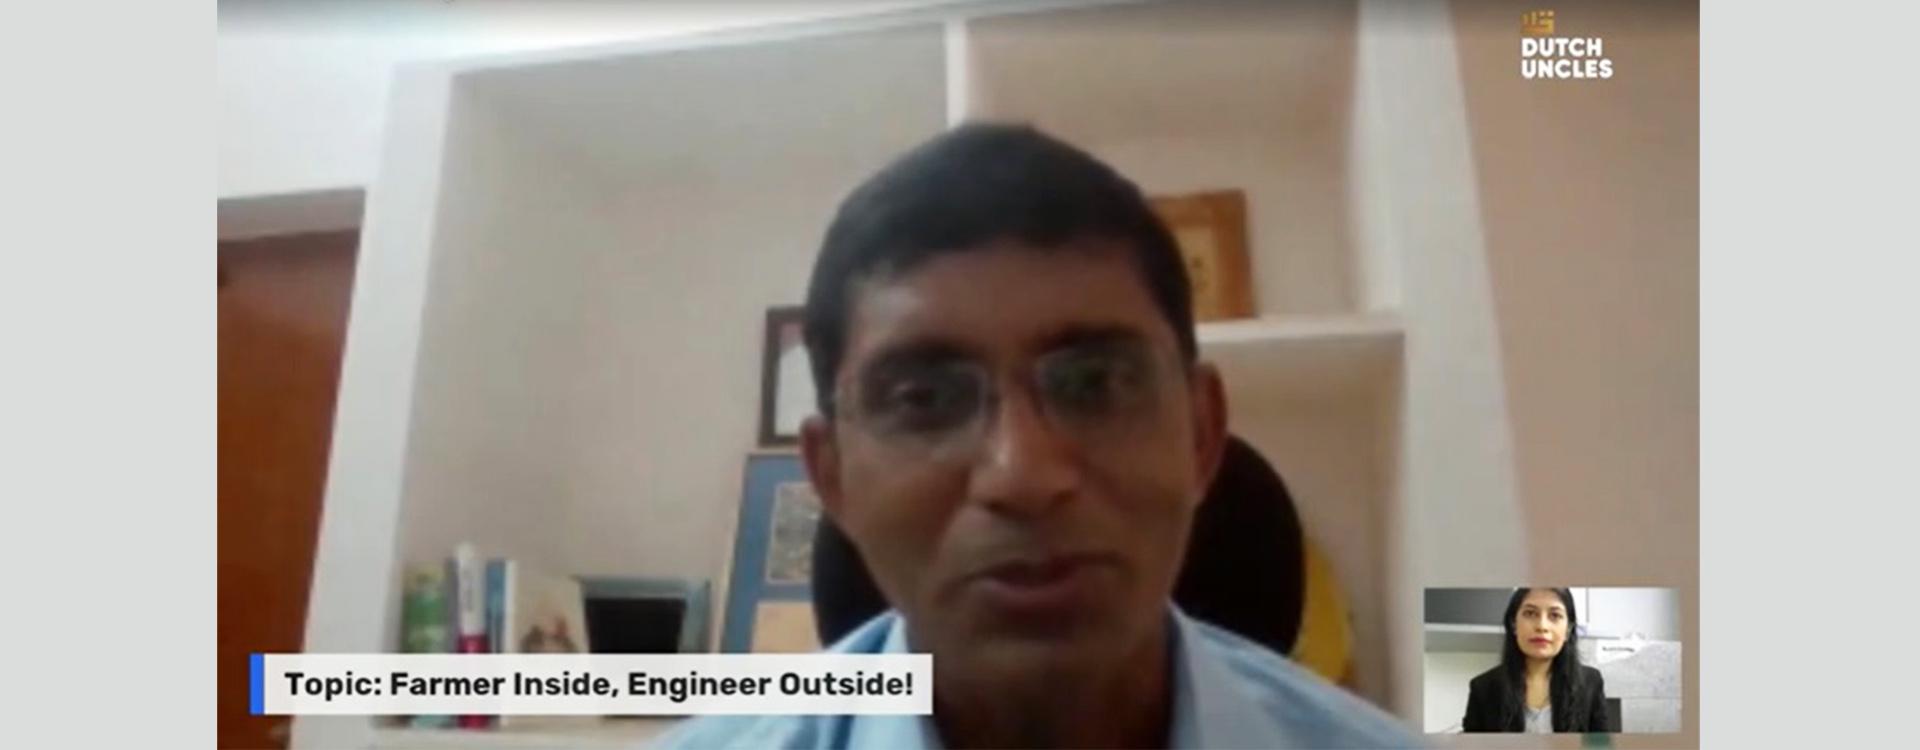 Interview With Mr. Kishore Indukuri on Dairy Farming